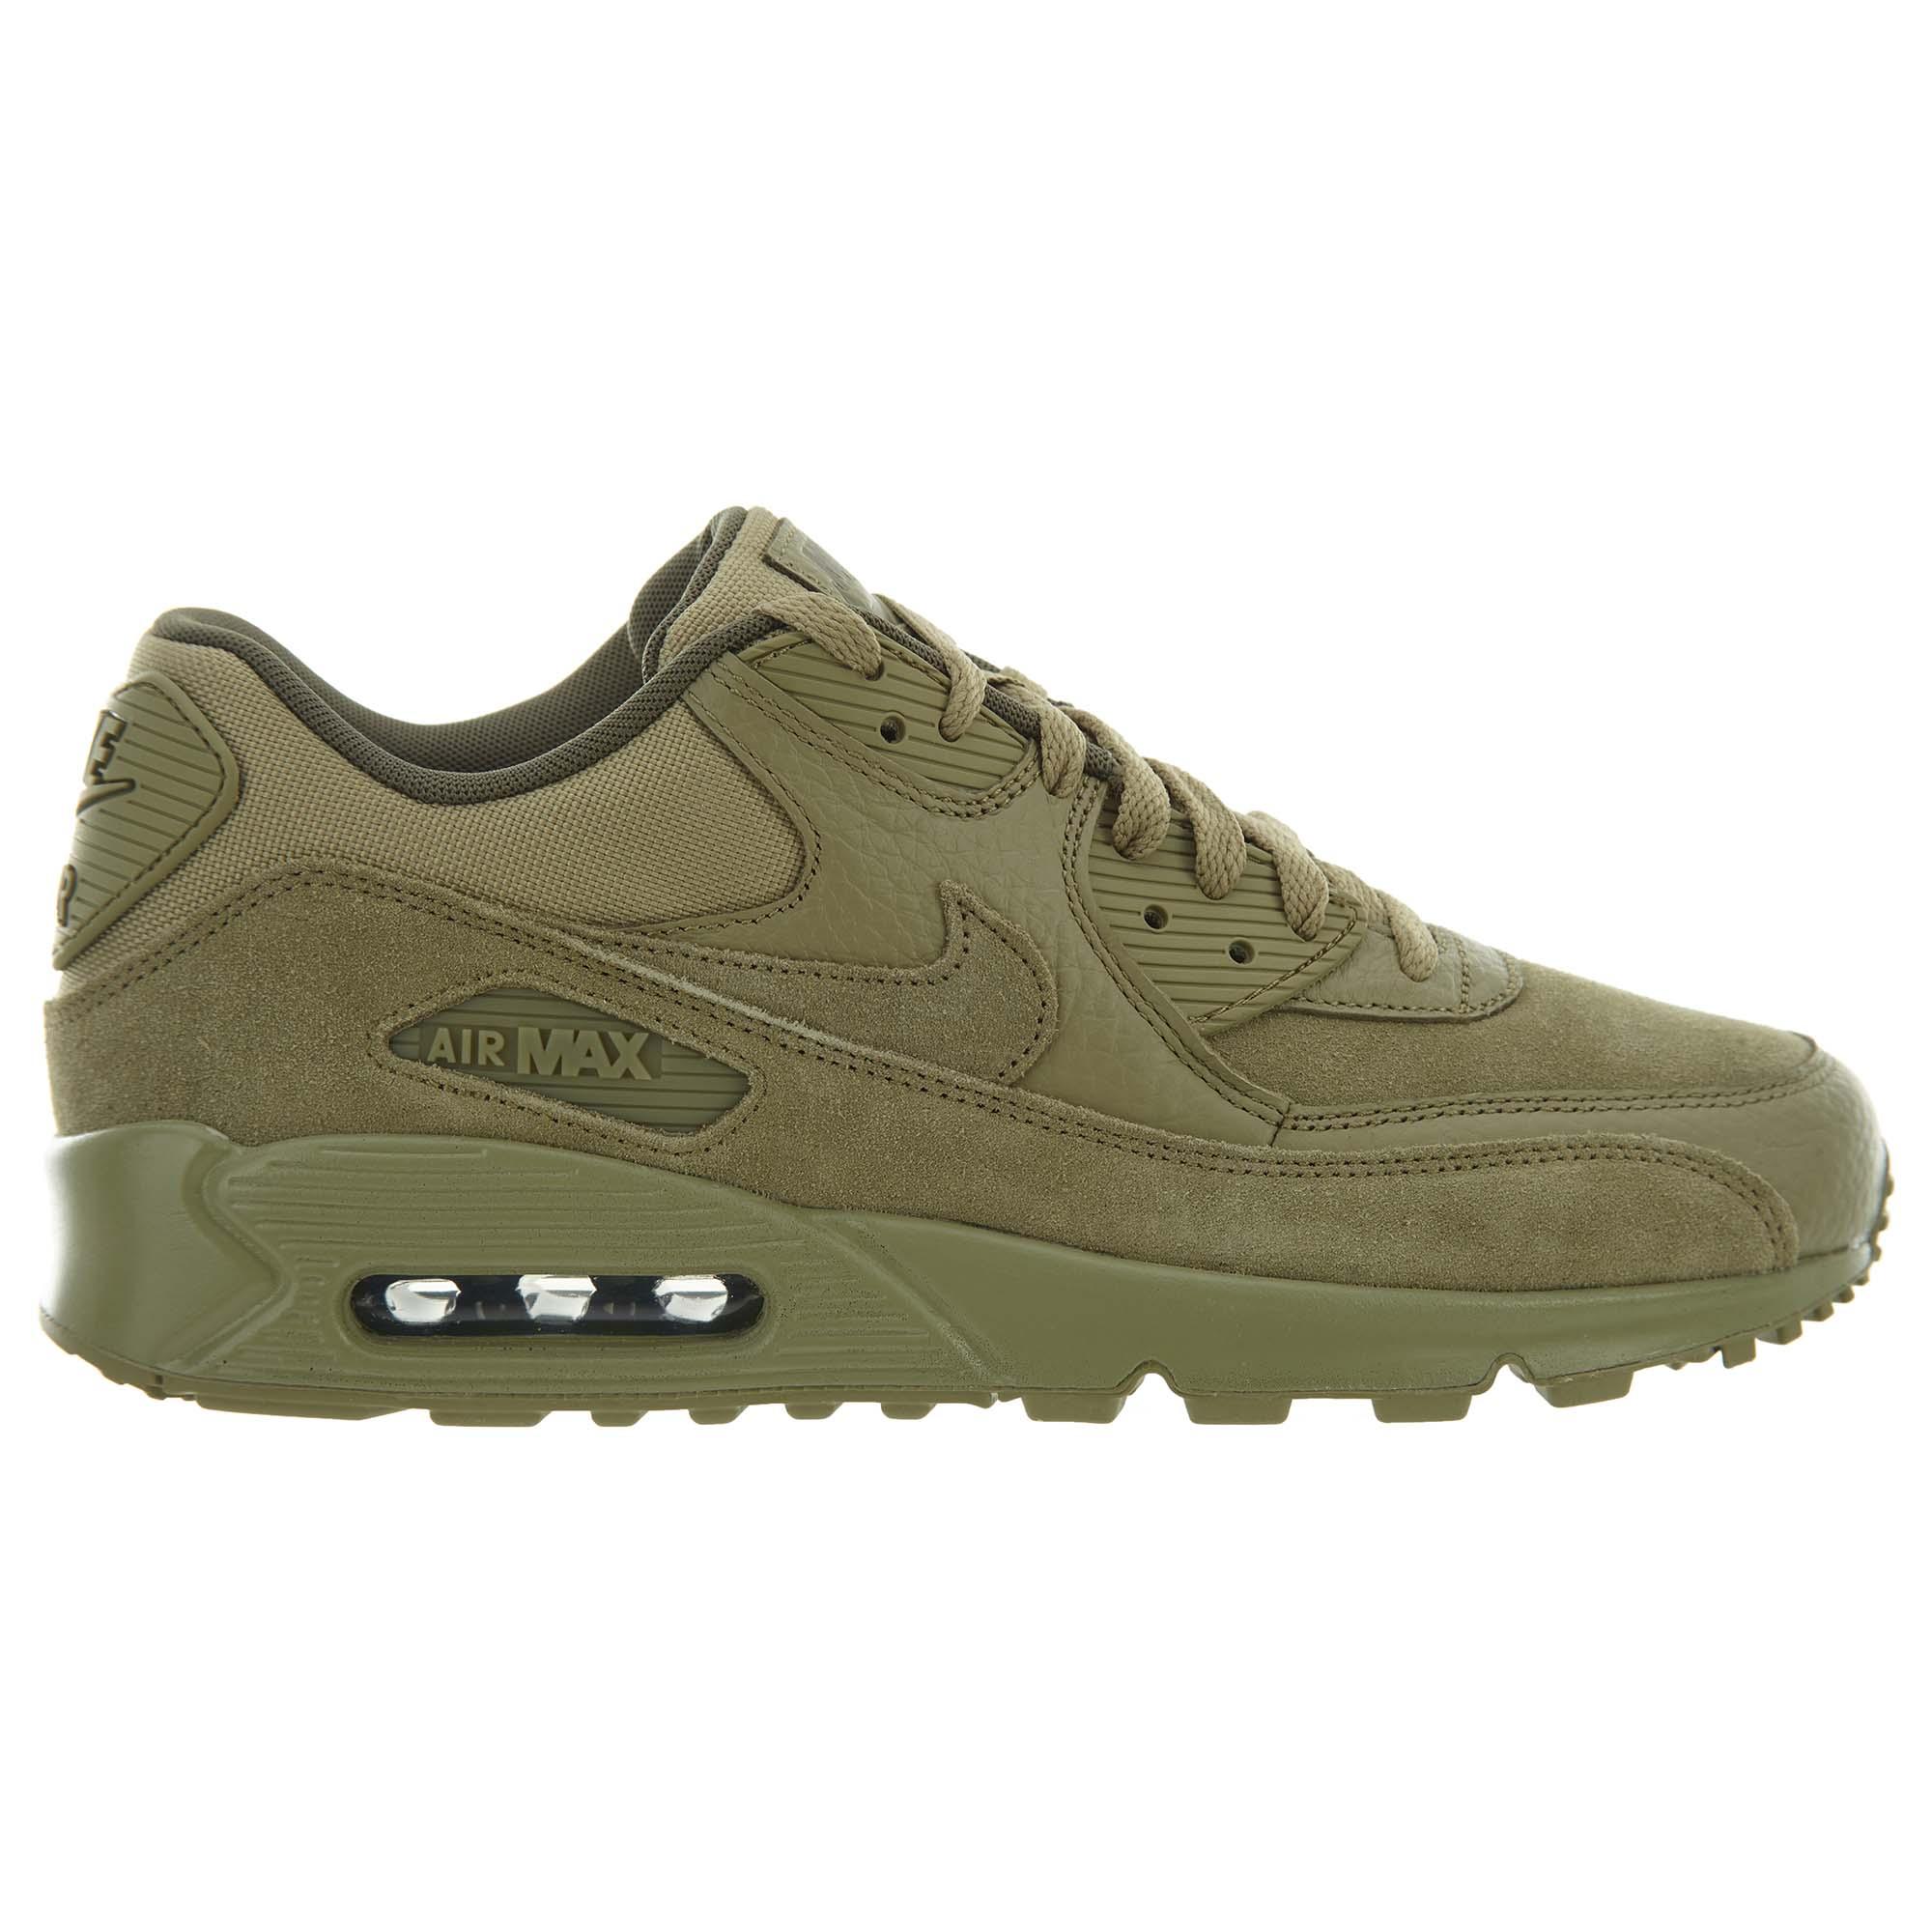 Nike Air Max 90 Premium Neutral Olive Neutral Olive - 700155-202